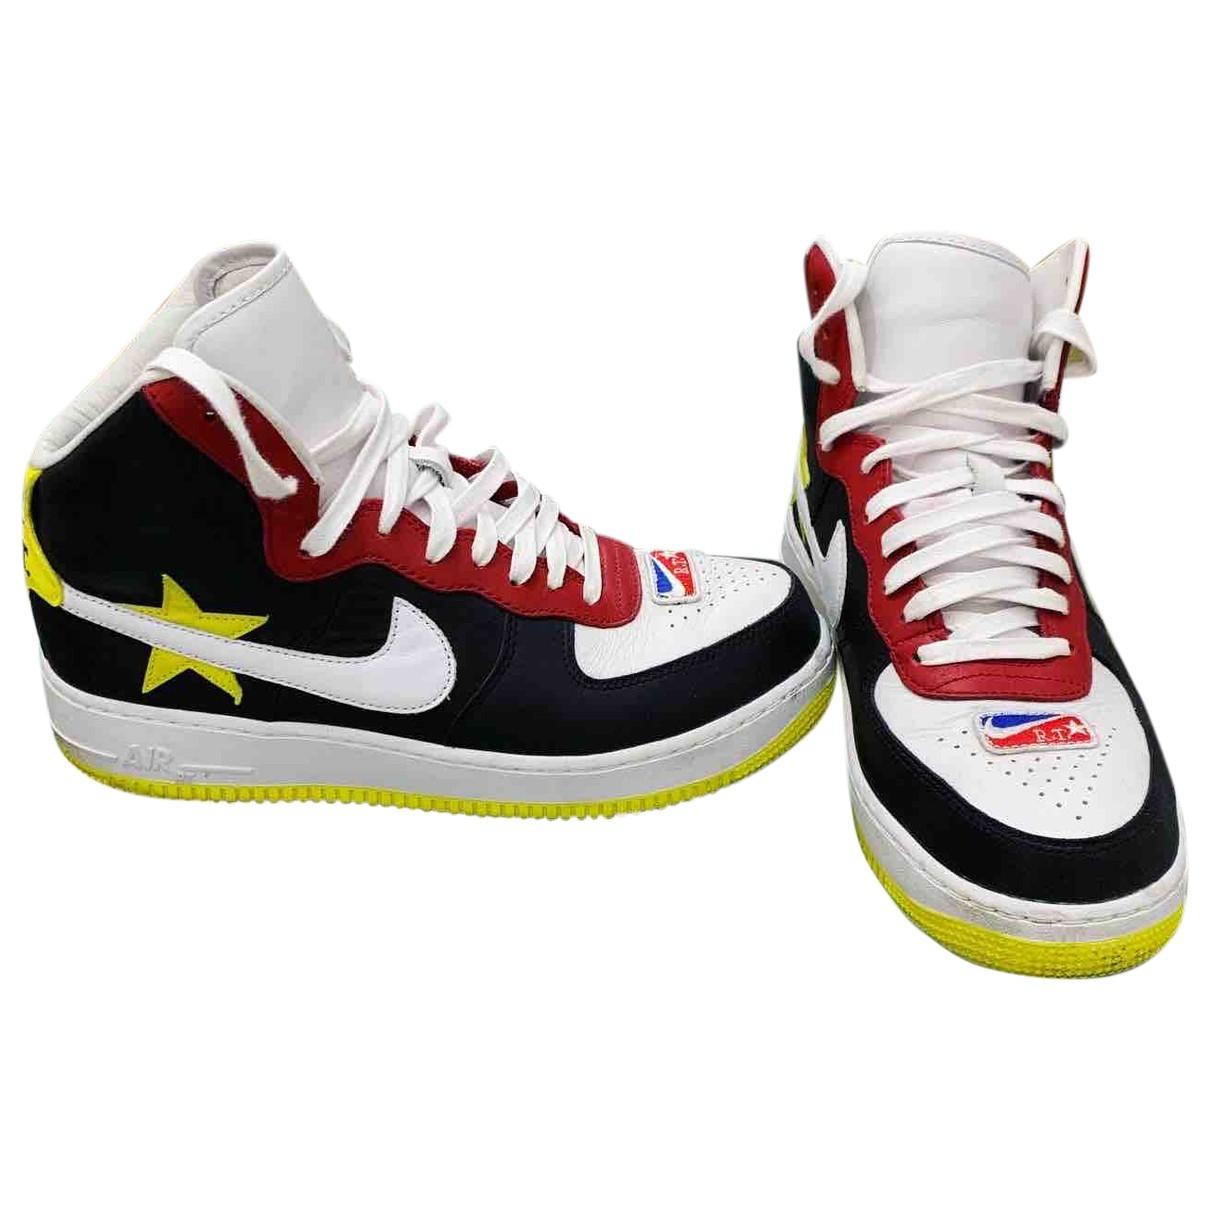 Deportivas de Cuero Nike By Riccardo Tisci